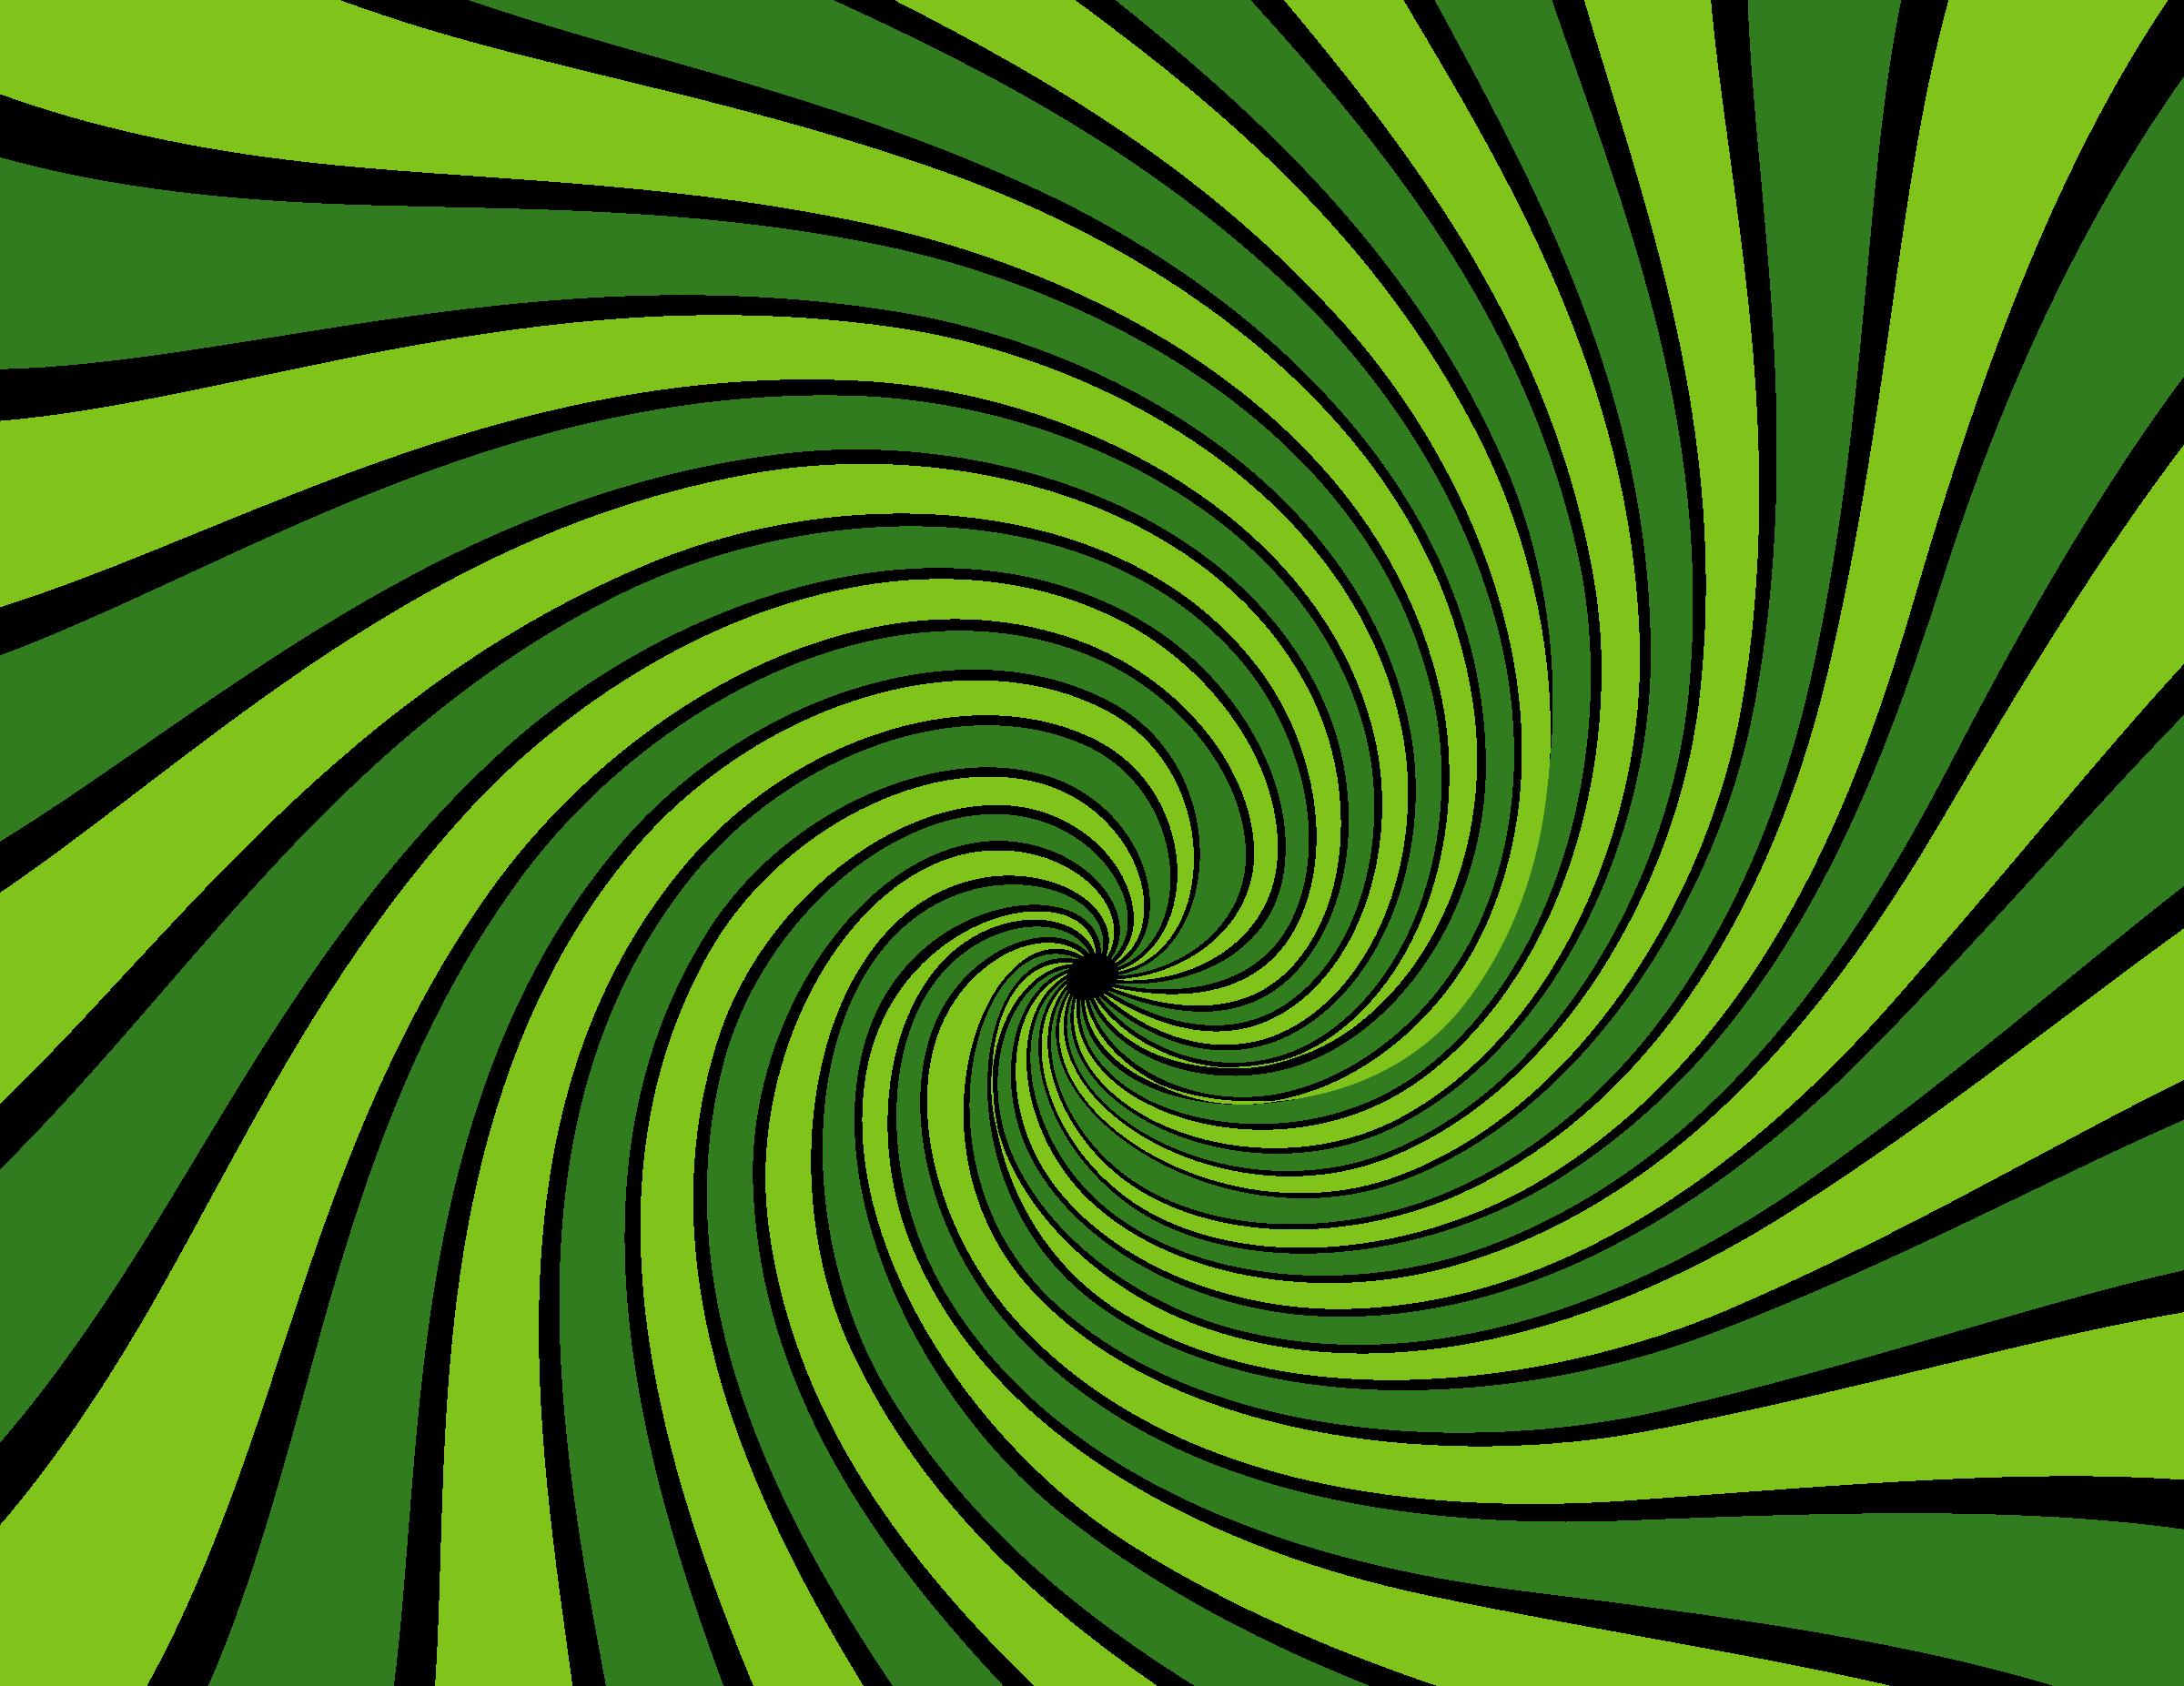 Clipart - Radial beams vector